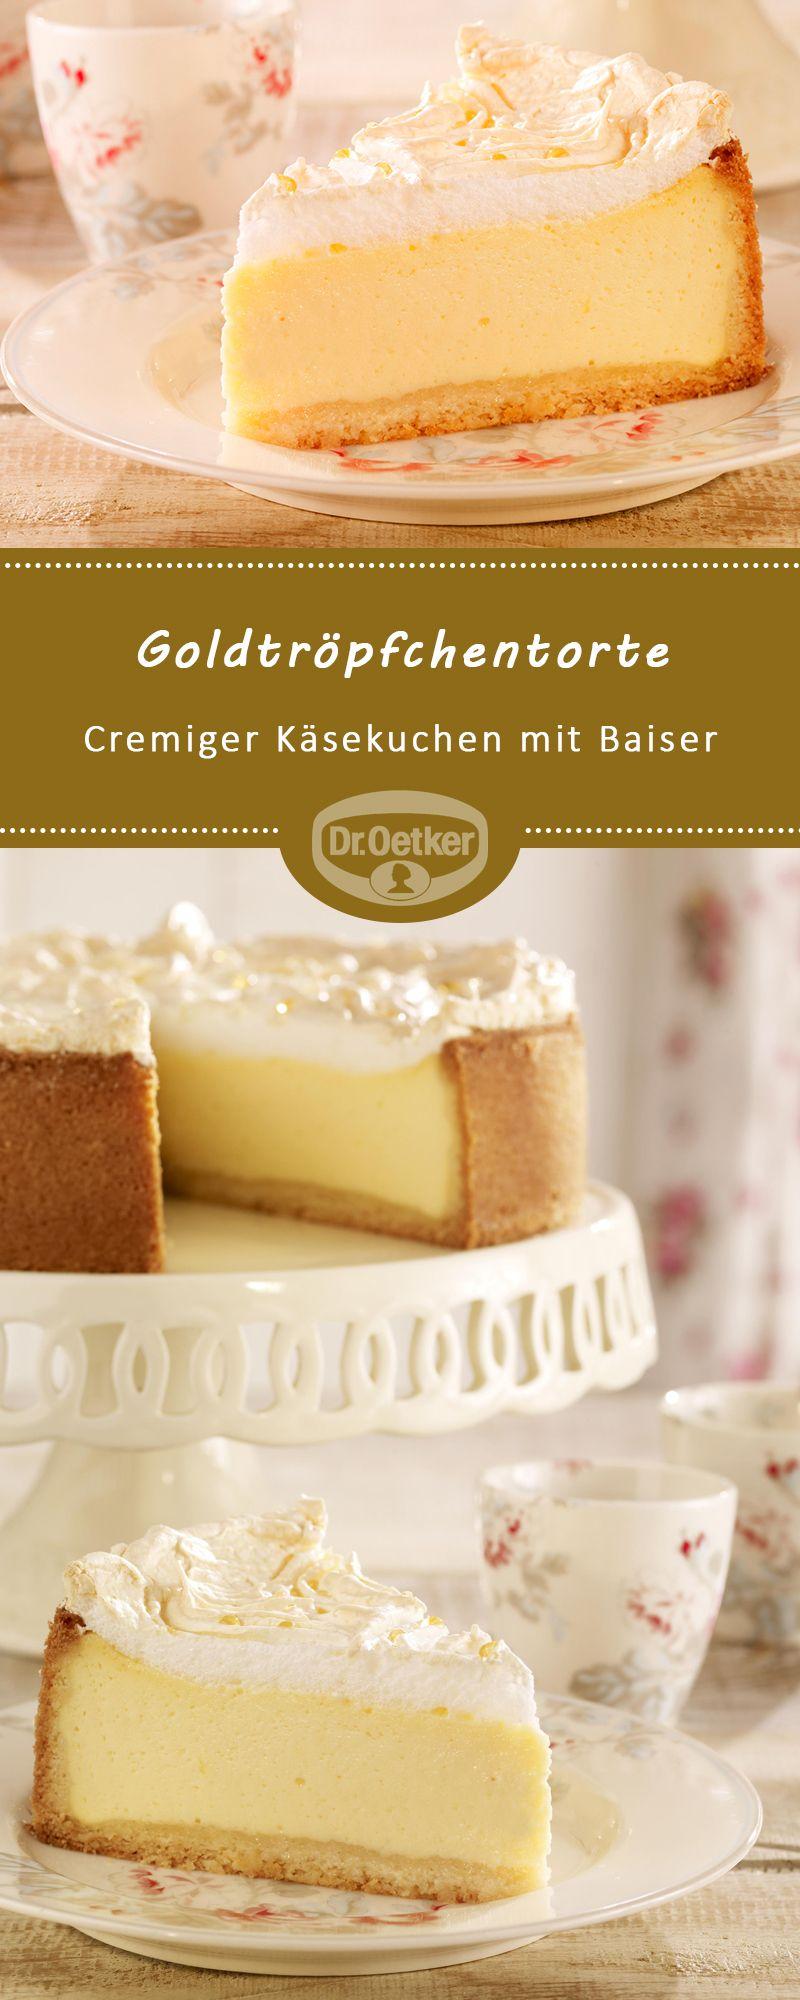 Goldtröpfchentorte #lemonblueberrycheesecake